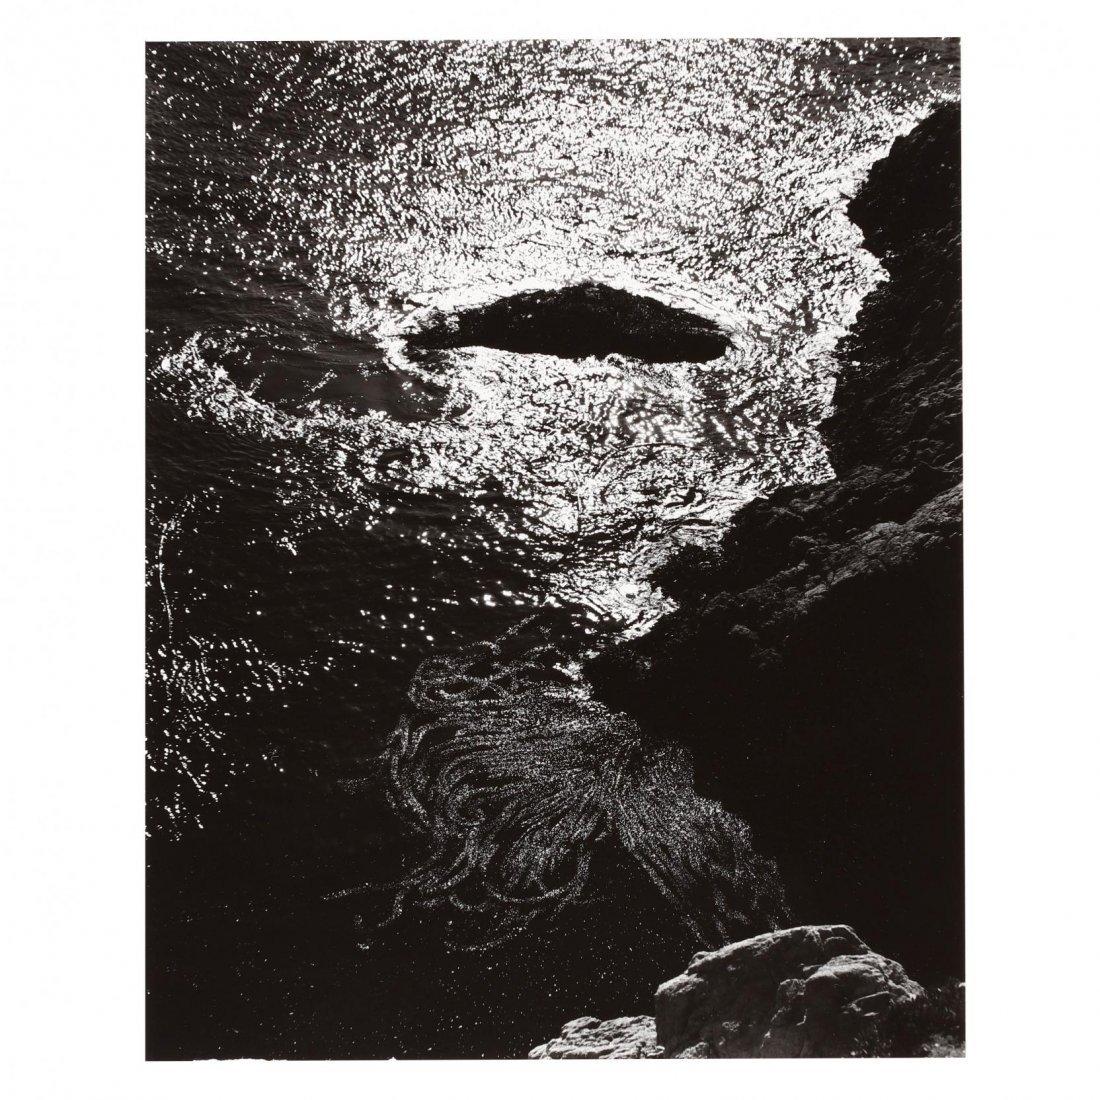 Edward Weston (American, 1886-1958),  China Cove, Point